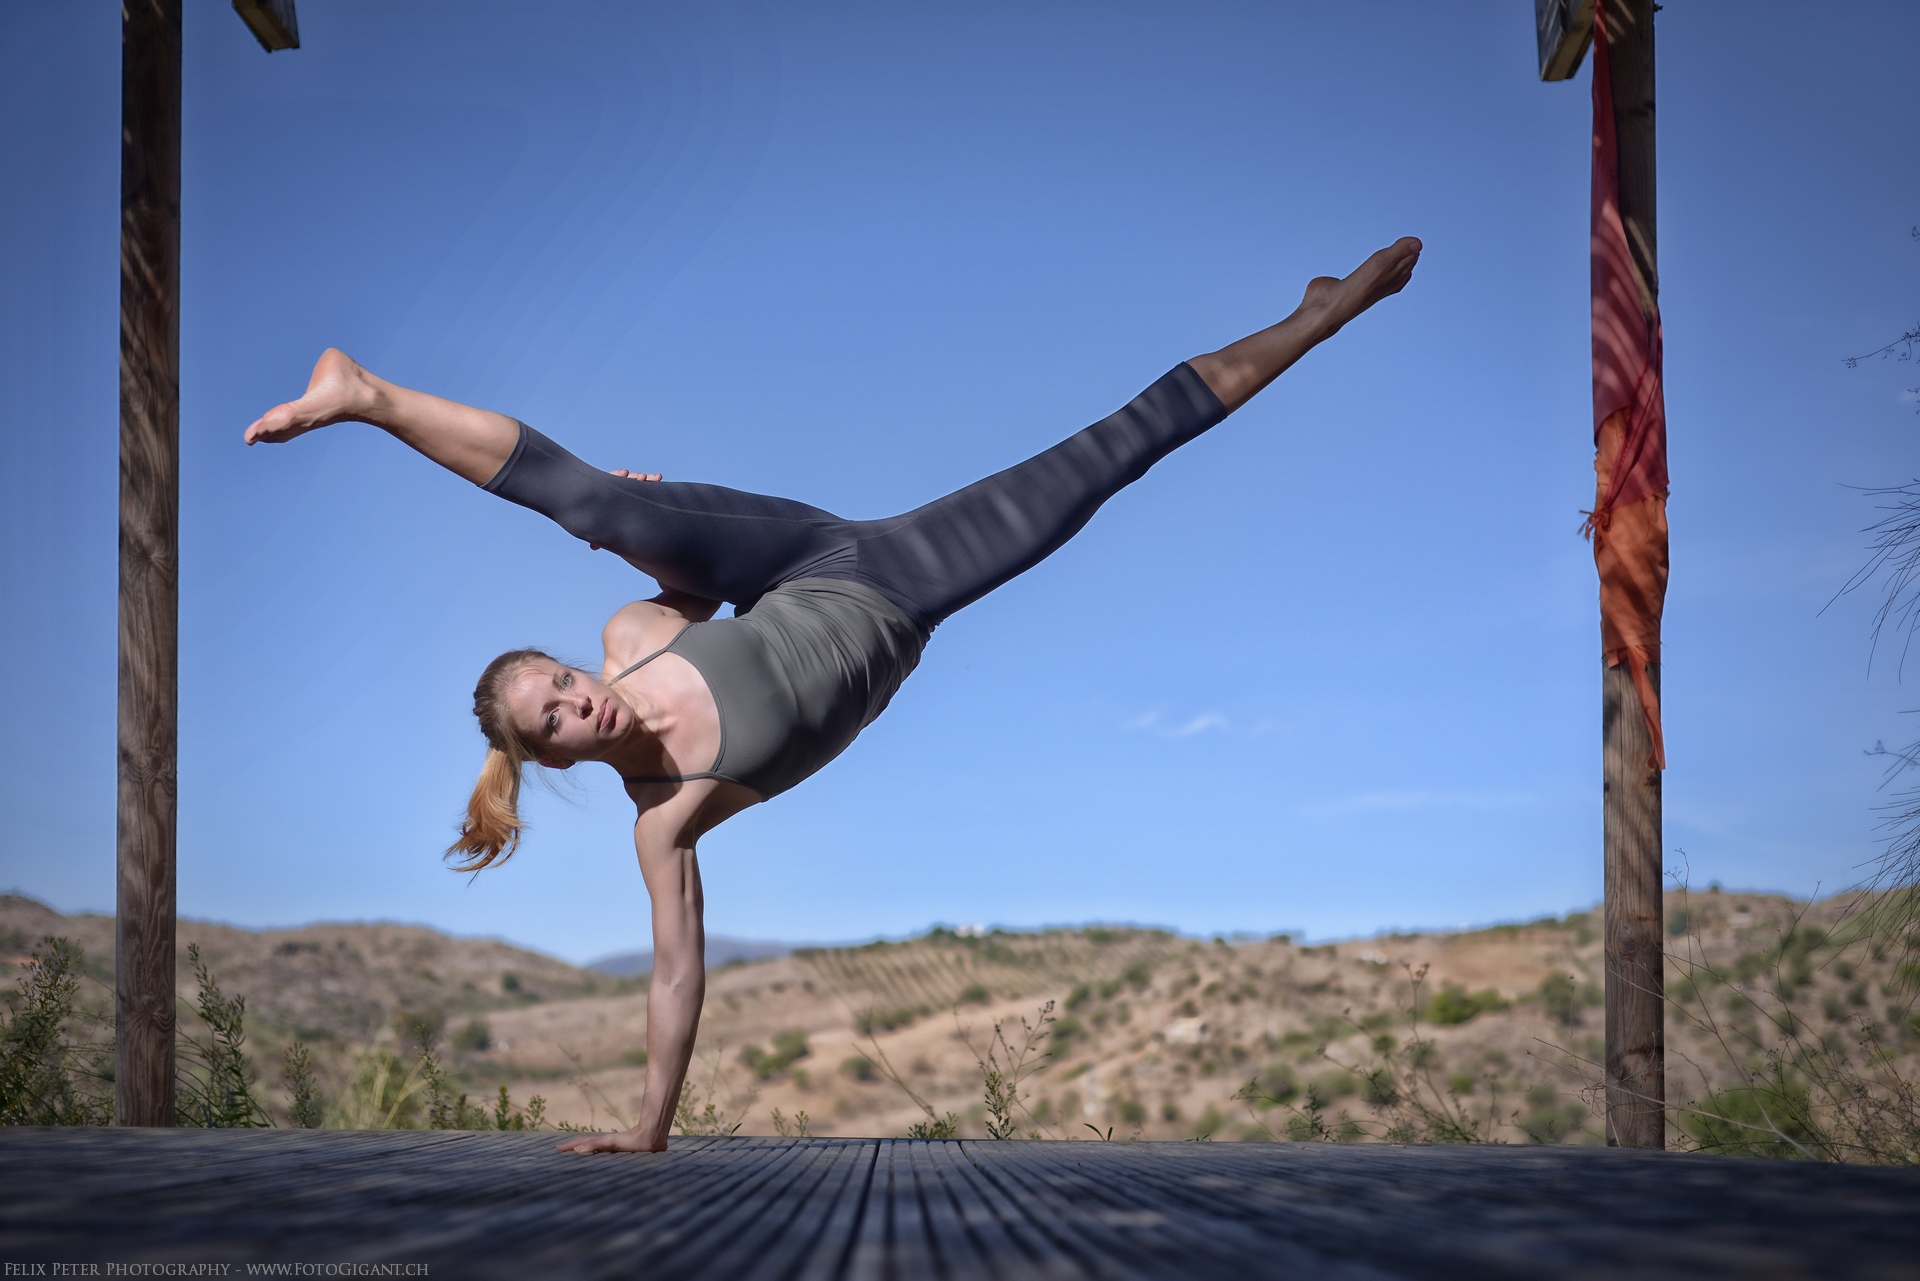 Felix-Peter-Yoga-Pilates-Dance-Fotografie_Bern_099.jpg